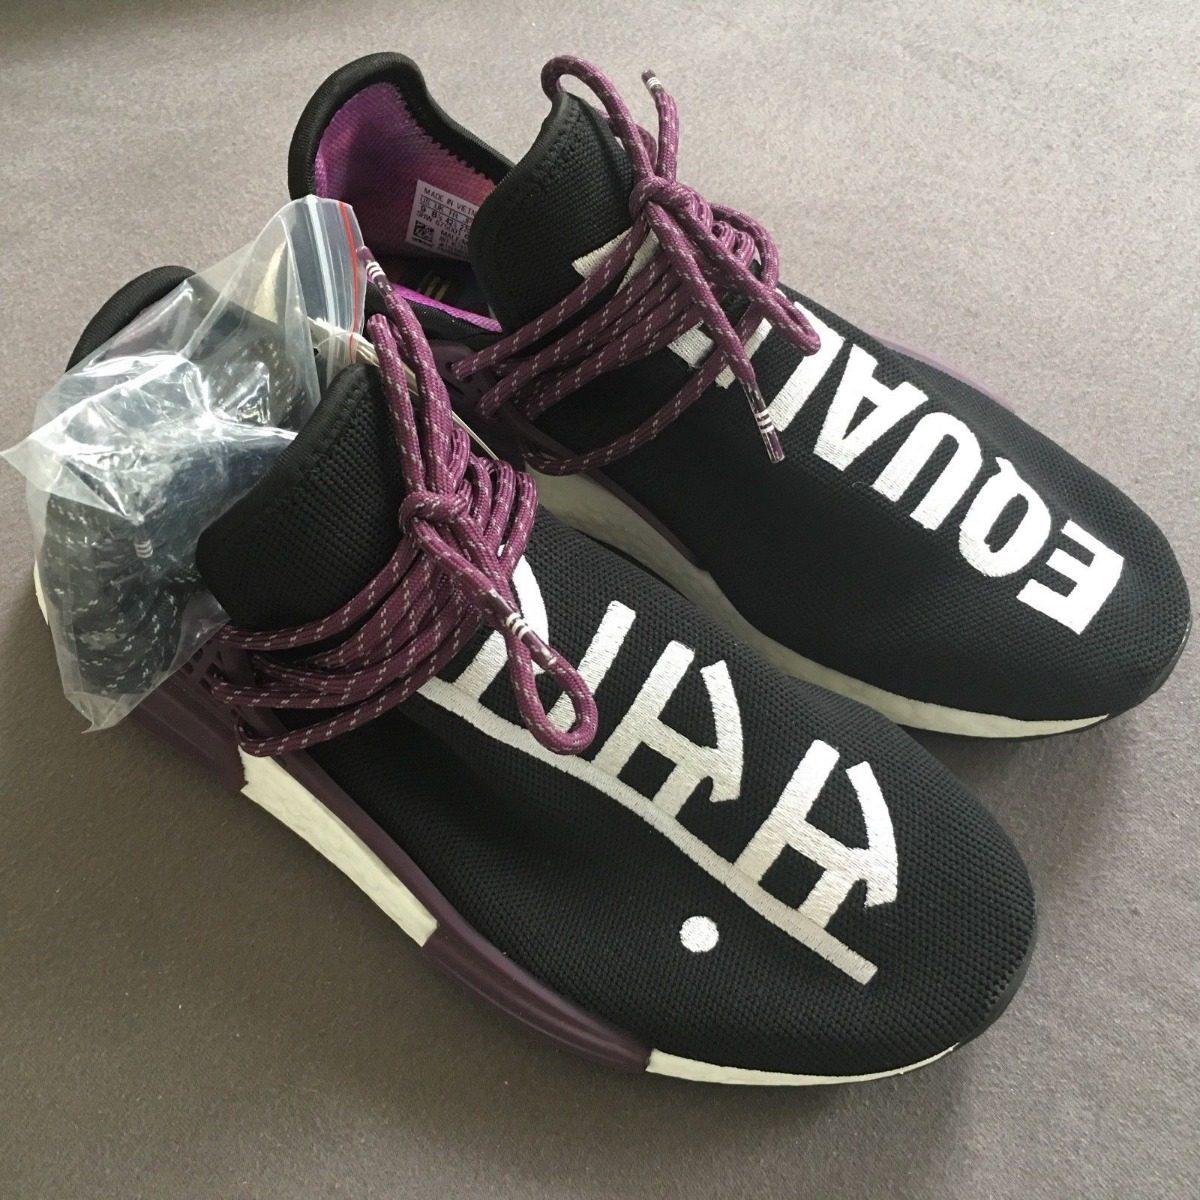 859630972ca14 zapatillas adidas pharrell williams hu holi nmd equality. Cargando zoom.